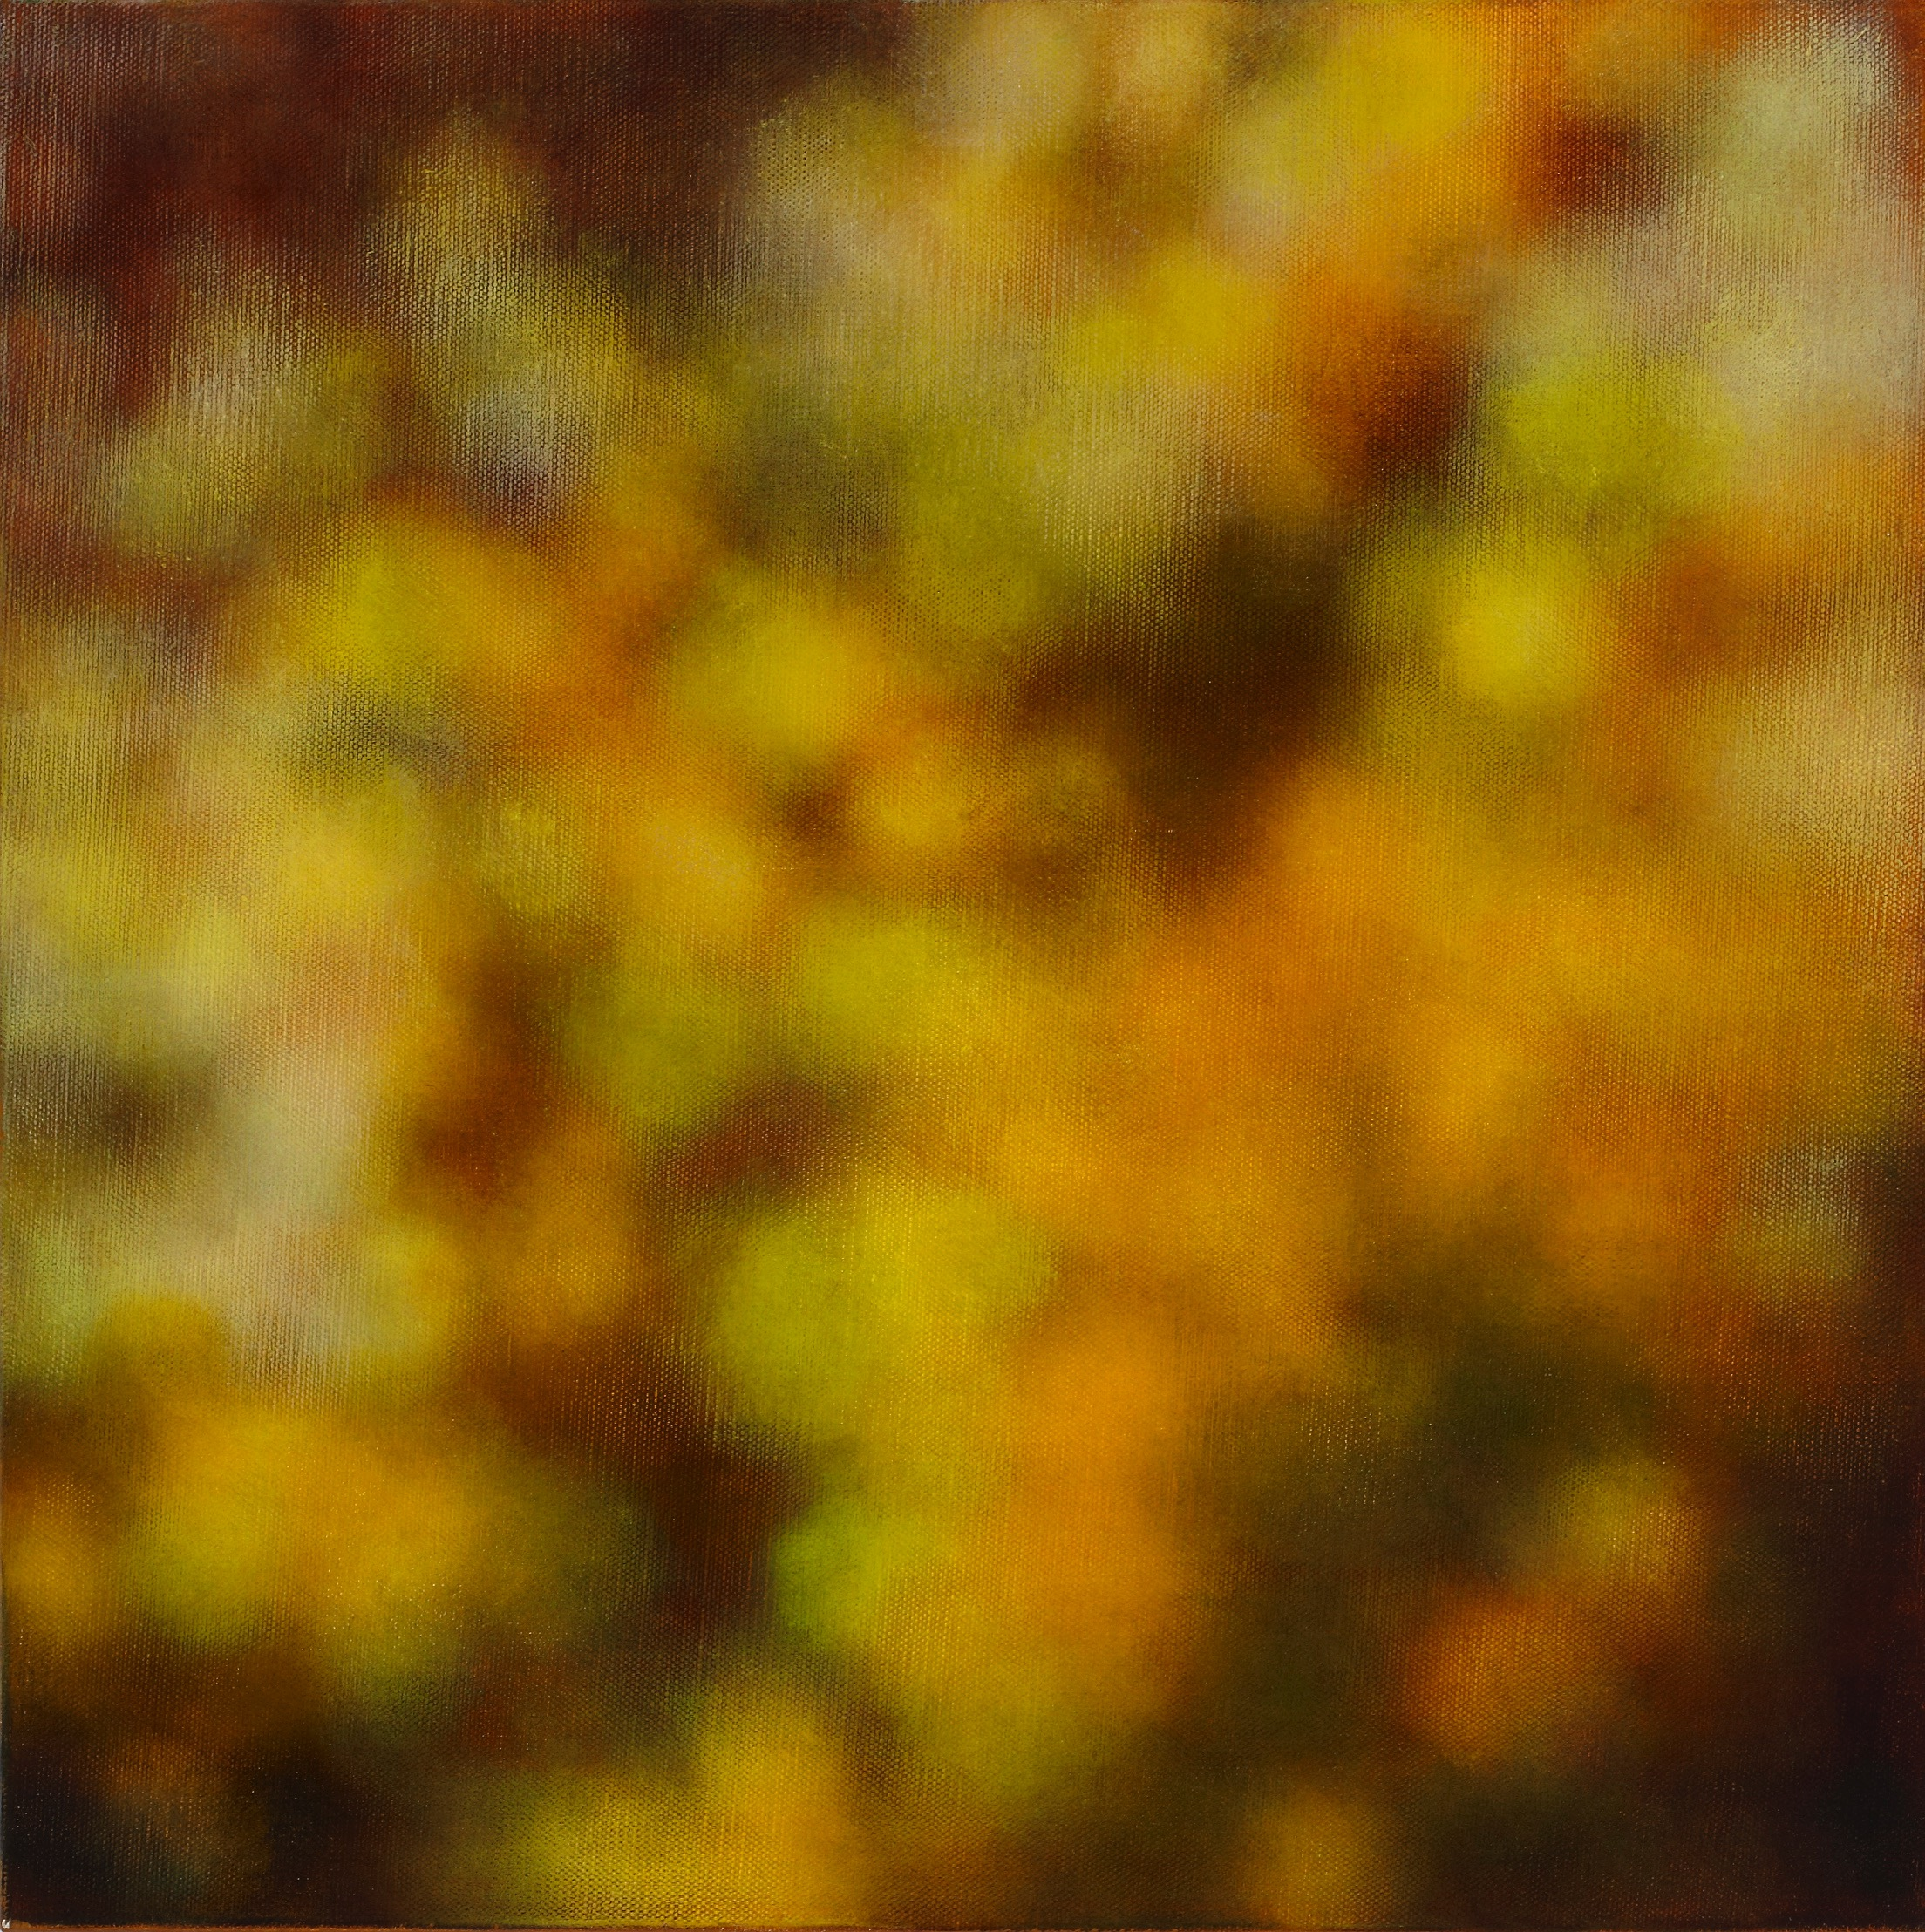 Wattle's light, 2010, oil on canvas, 61x61cm